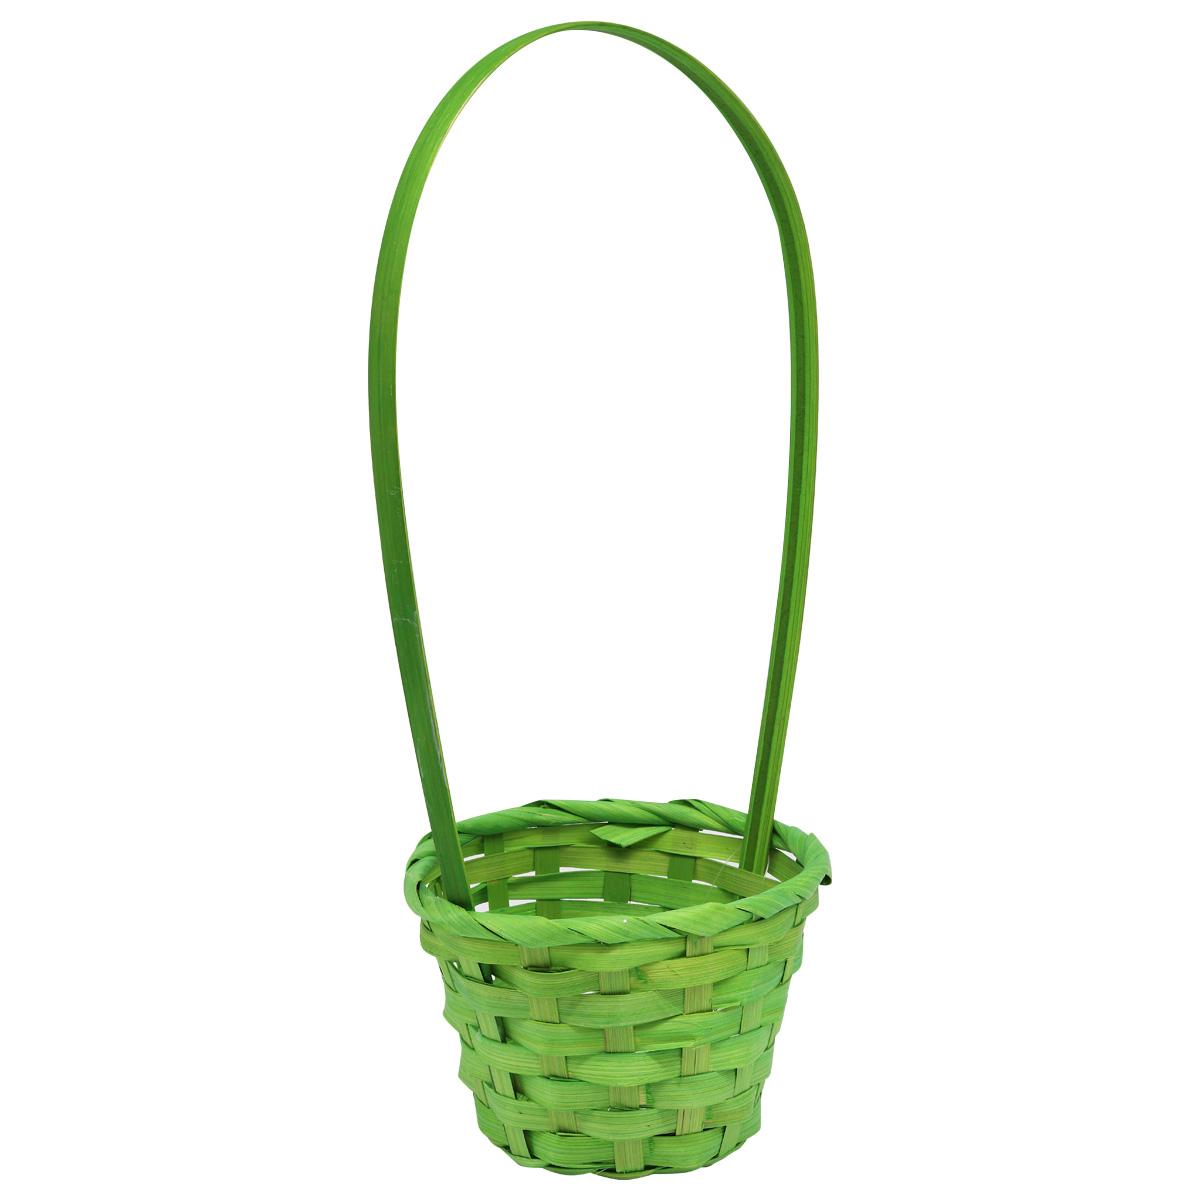 19HJ19092 Корзина плетеная бамбук 13*9*H28см, цв. зеленый Астра